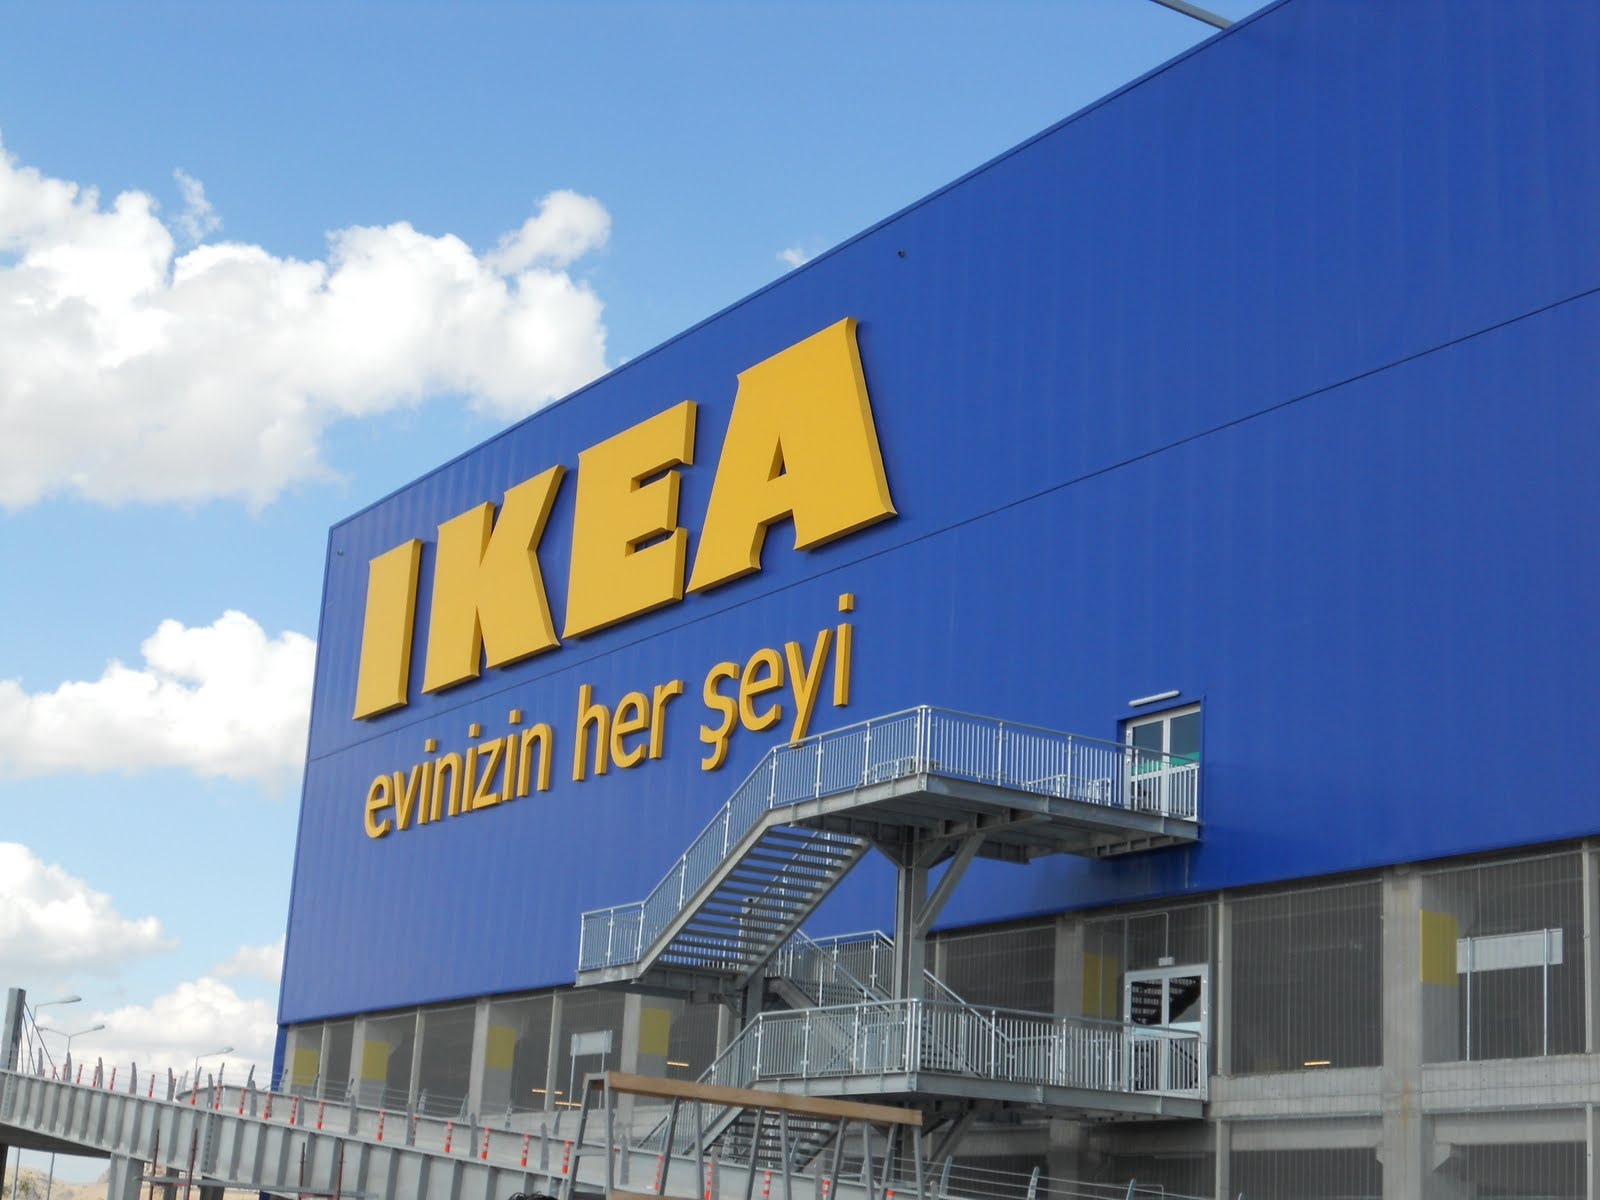 Ikea ankara ikea in ankara turkey - Ikea wanduhr turkis ...